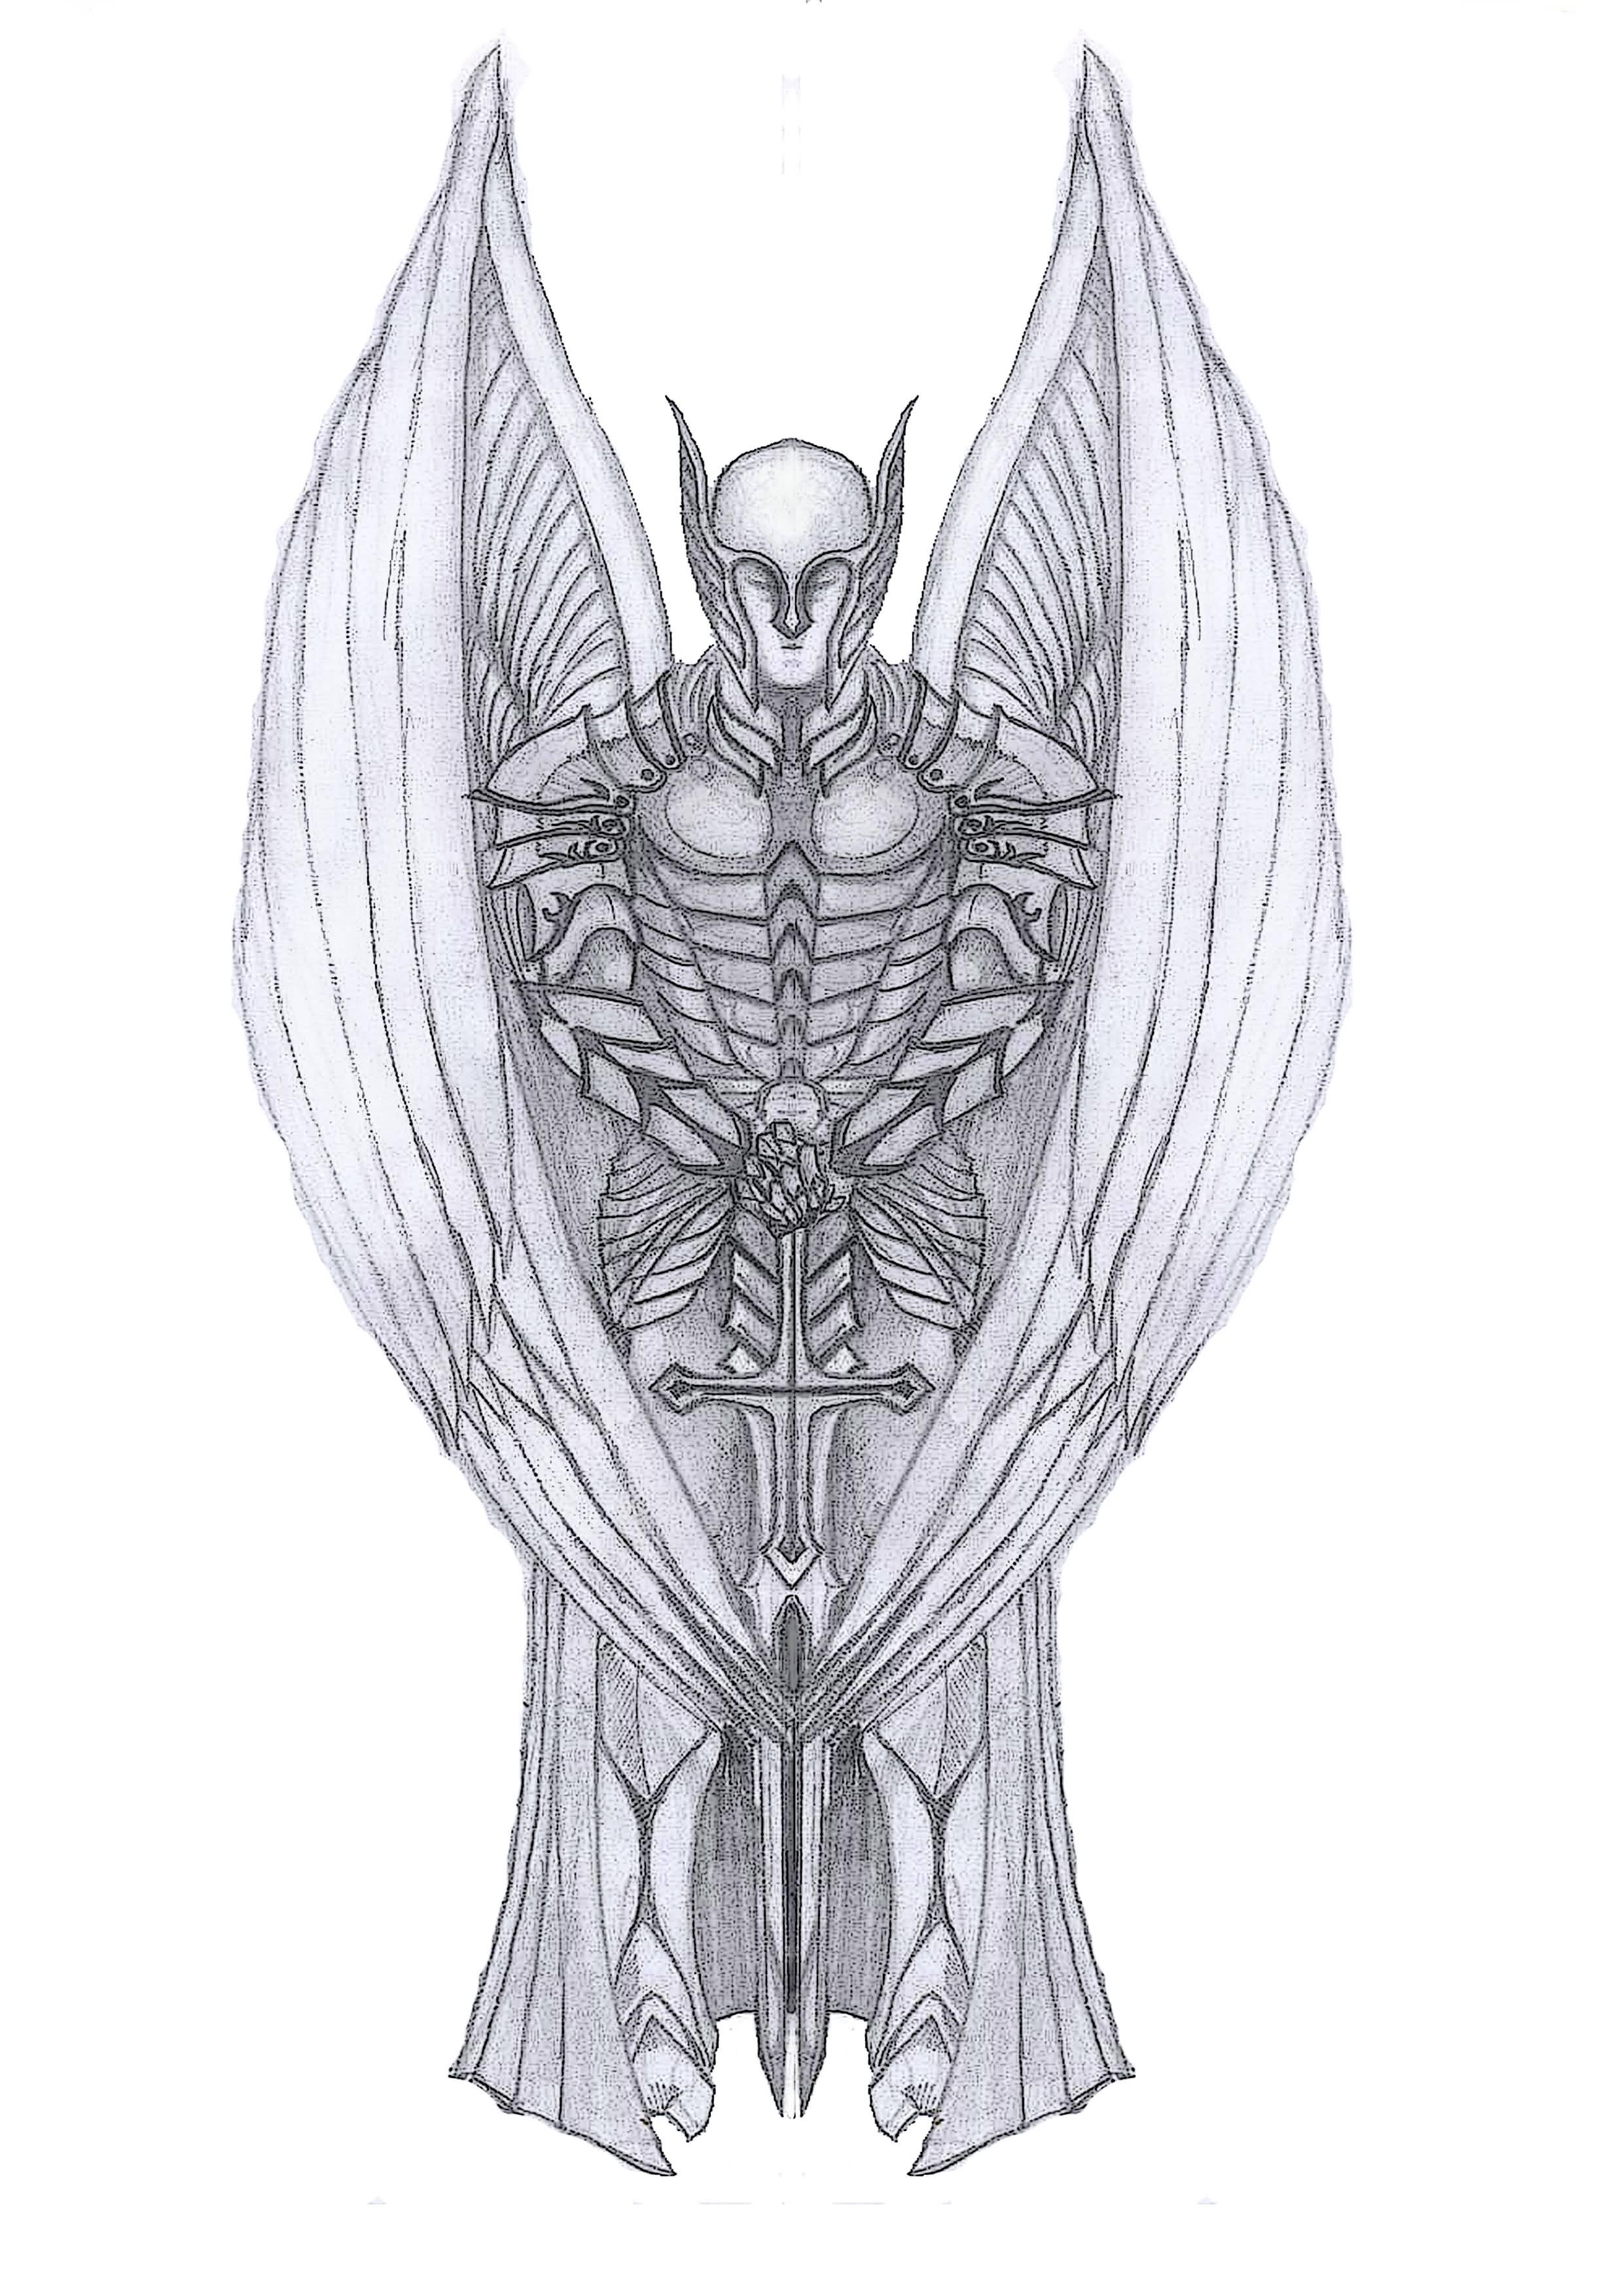 20 latest archangel michael tattoos designs. Black Bedroom Furniture Sets. Home Design Ideas